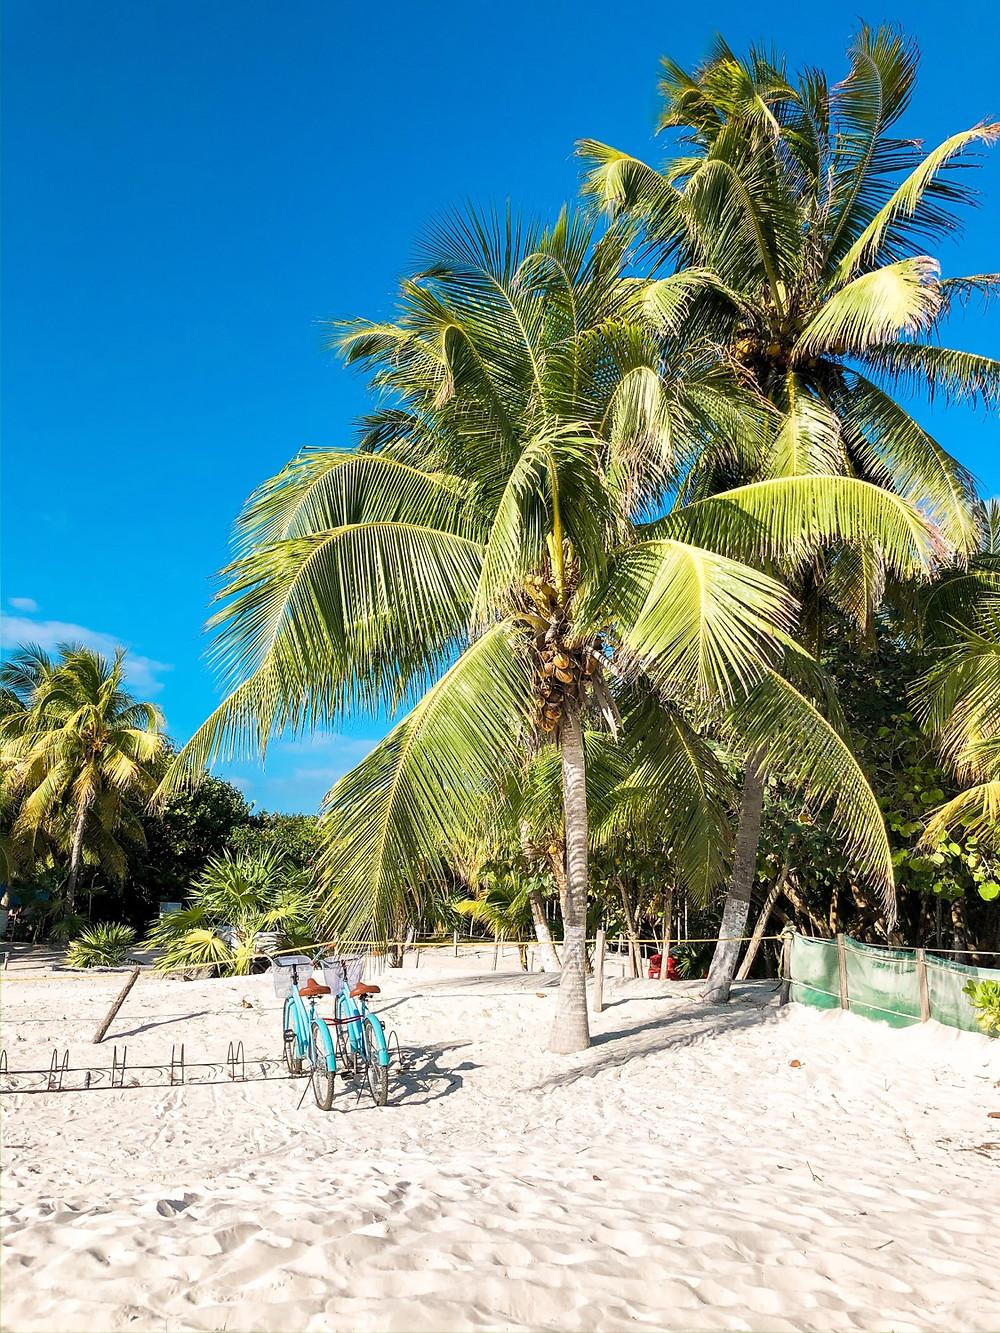 Mexiko-Tulum-Sehenswertes-playa-paraiso-Strand